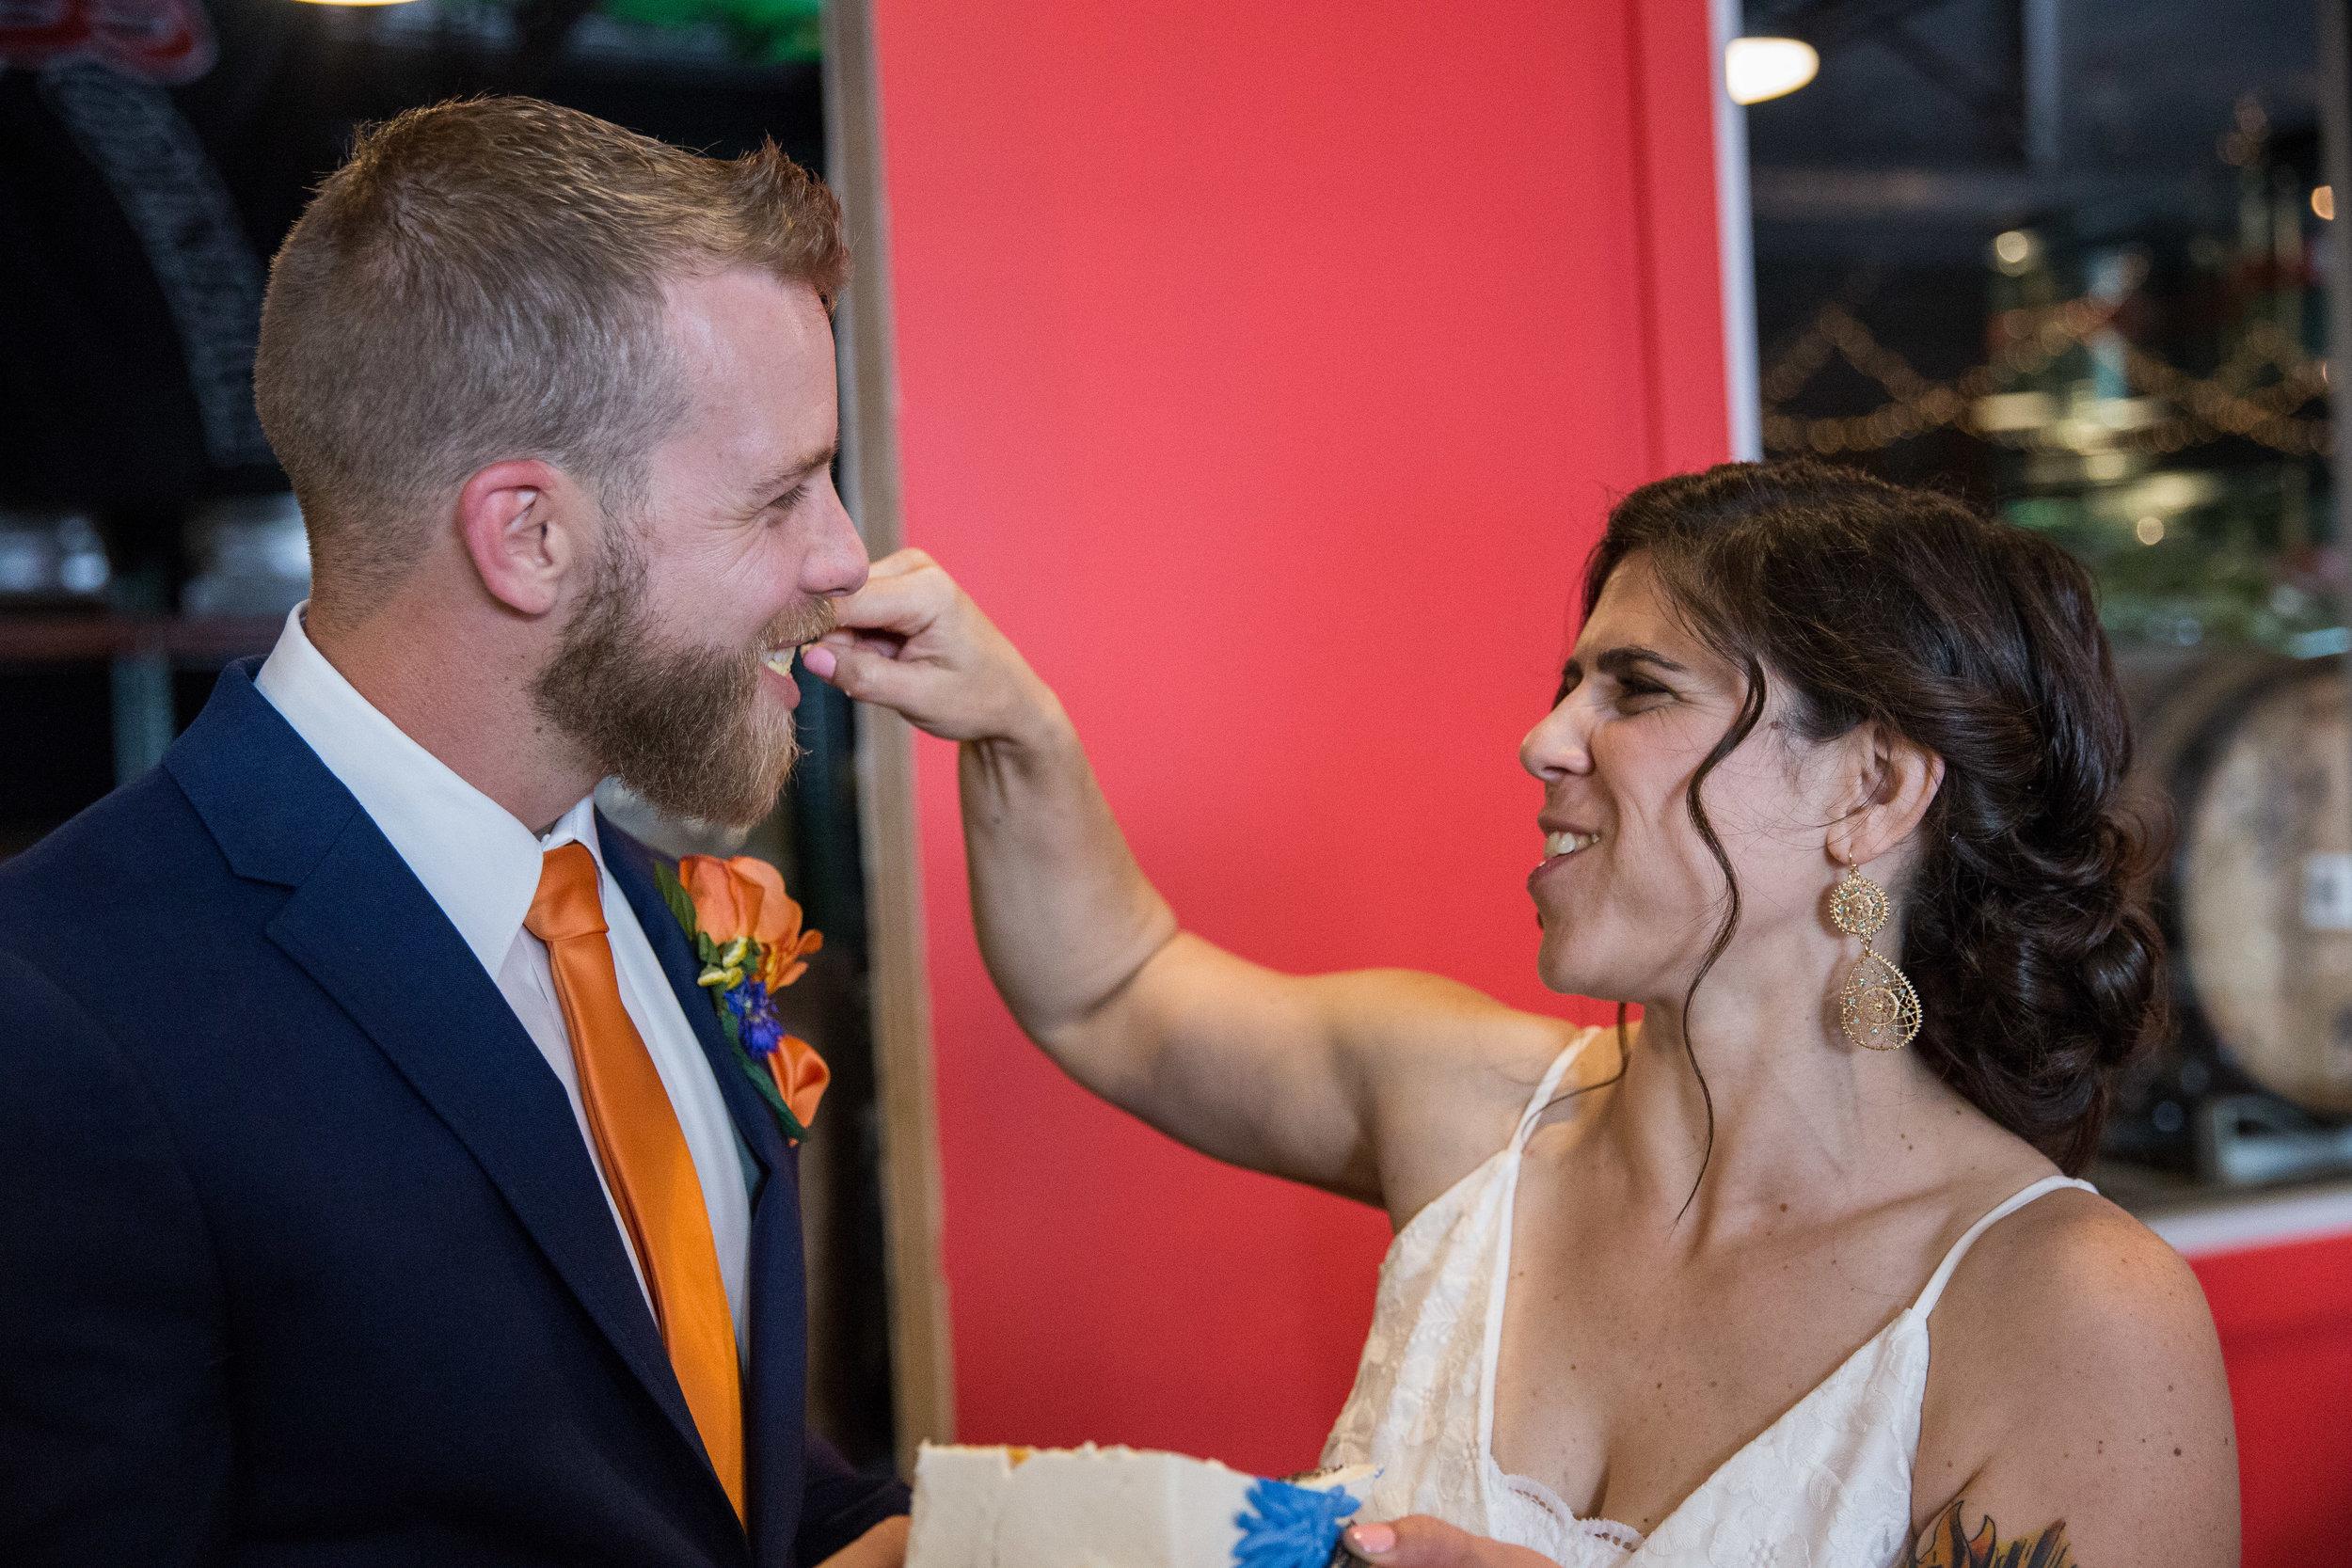 Natalie and Dallas Mooney Wedding 6-8-19_Tania Watt Photography-548.jpg